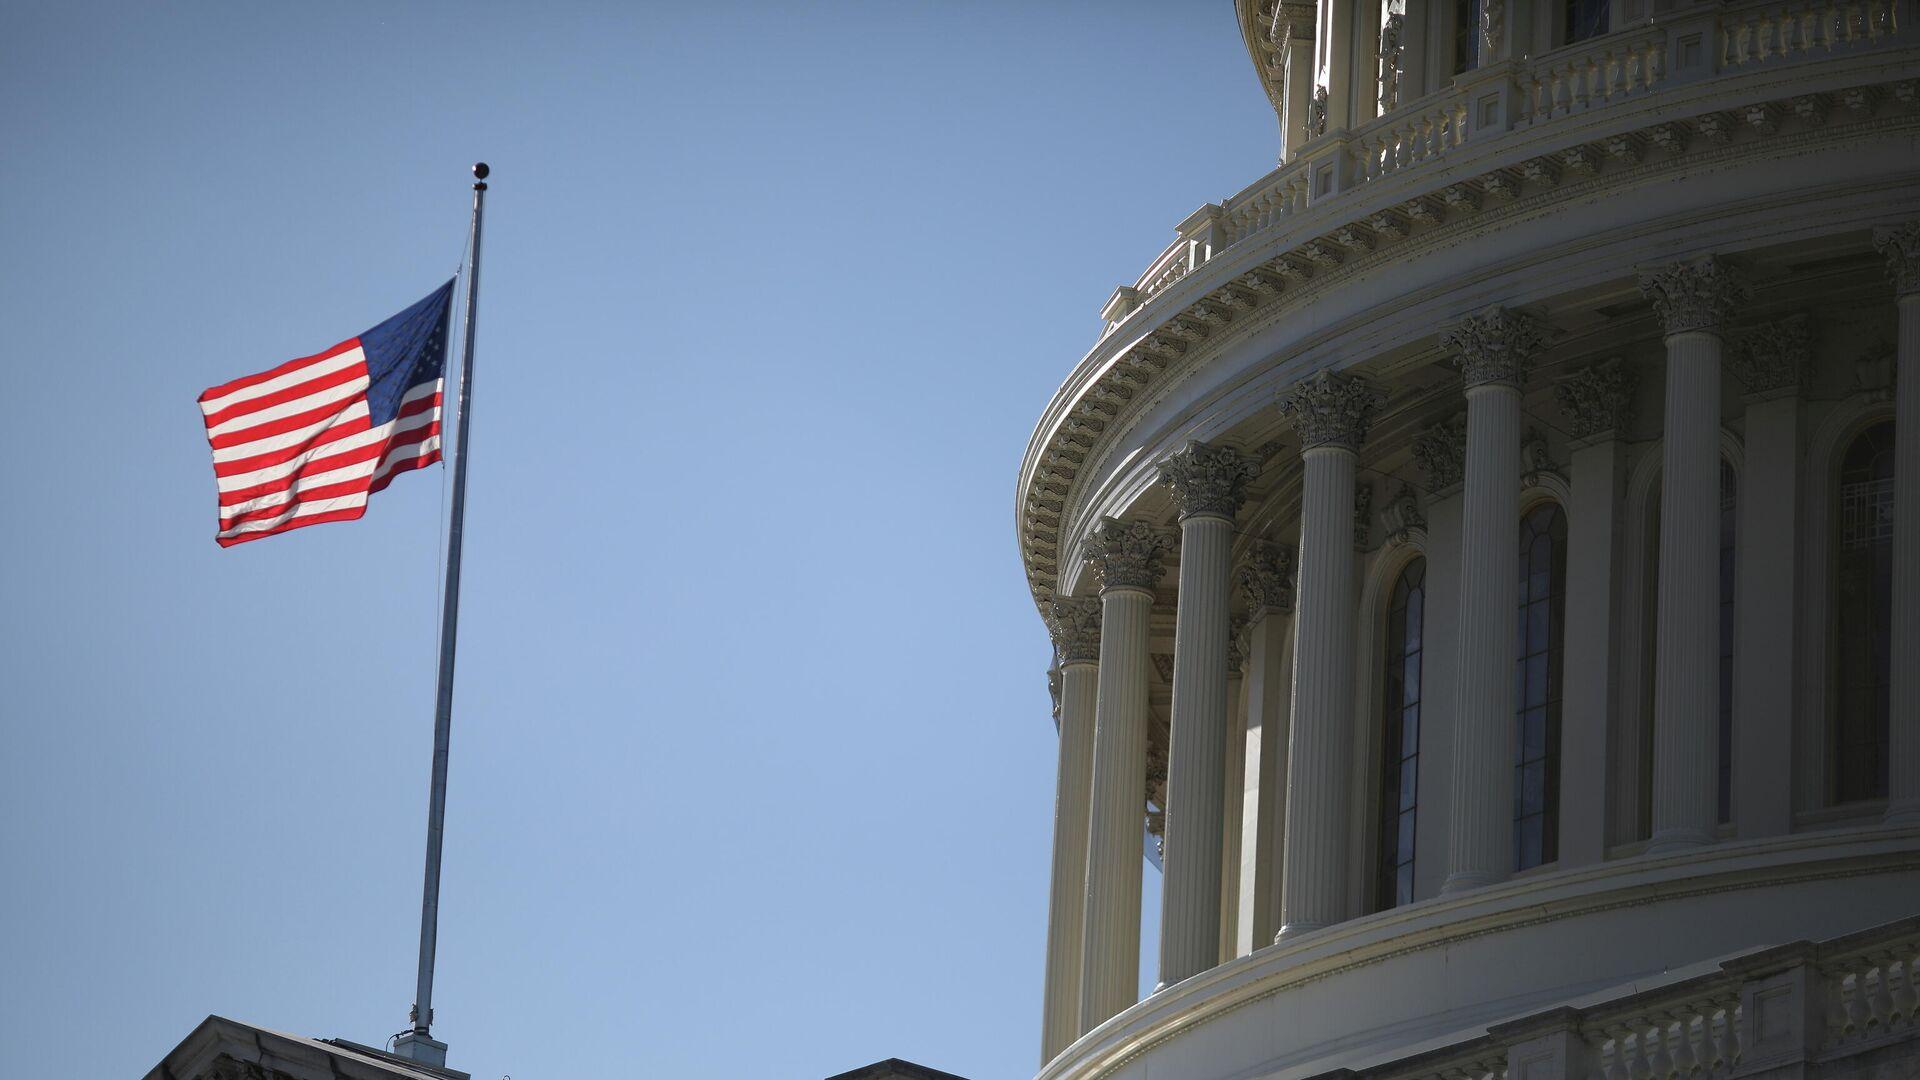 Das Kapitol in Washington, D.C. – Sitz des US-Kongresses - SNA, 1920, 23.12.2020